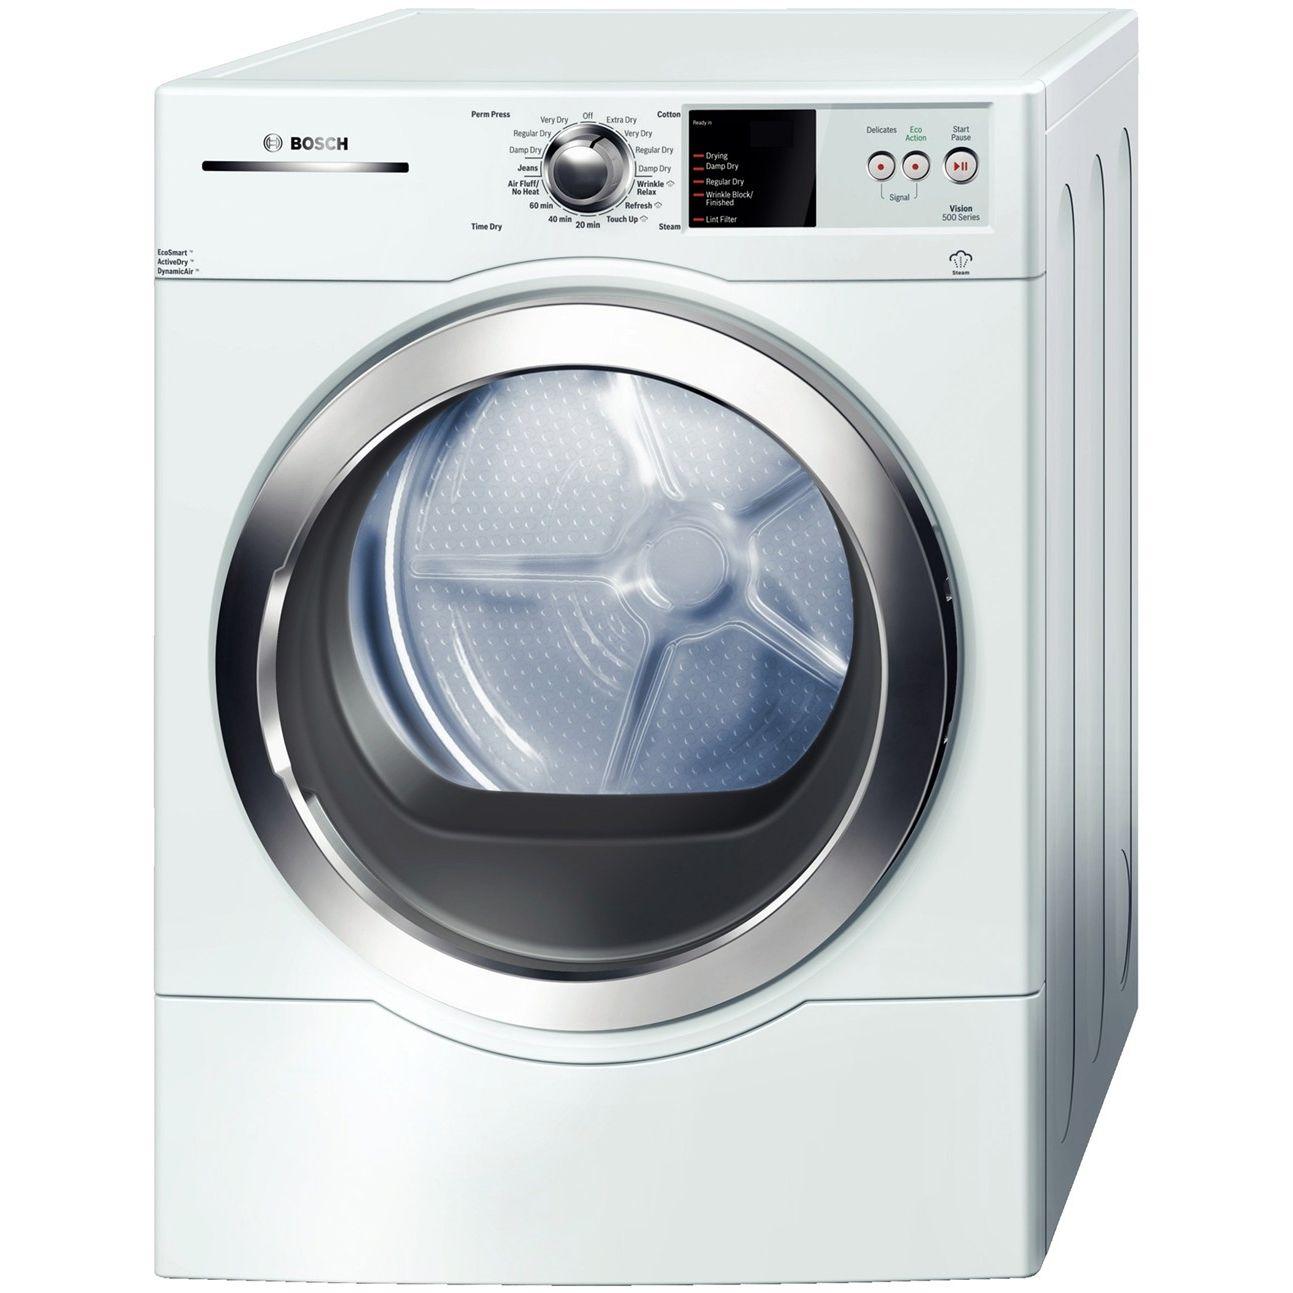 Bosch WTVC6530UC 500 Series Gas Dryer